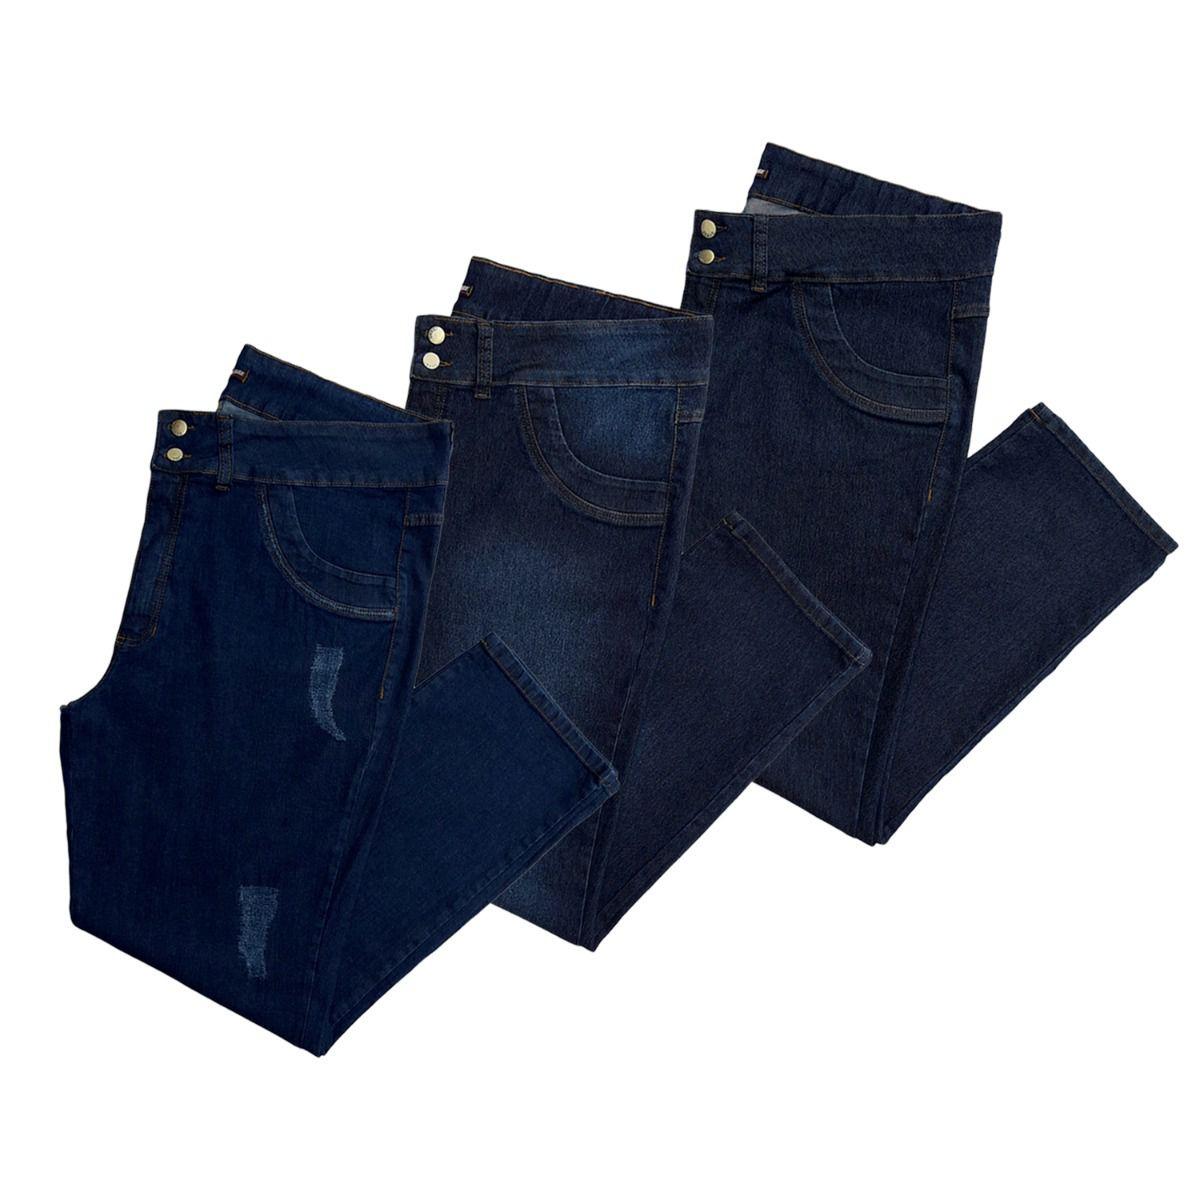 Kit 03 Calças Jeans Femininas Plus Size